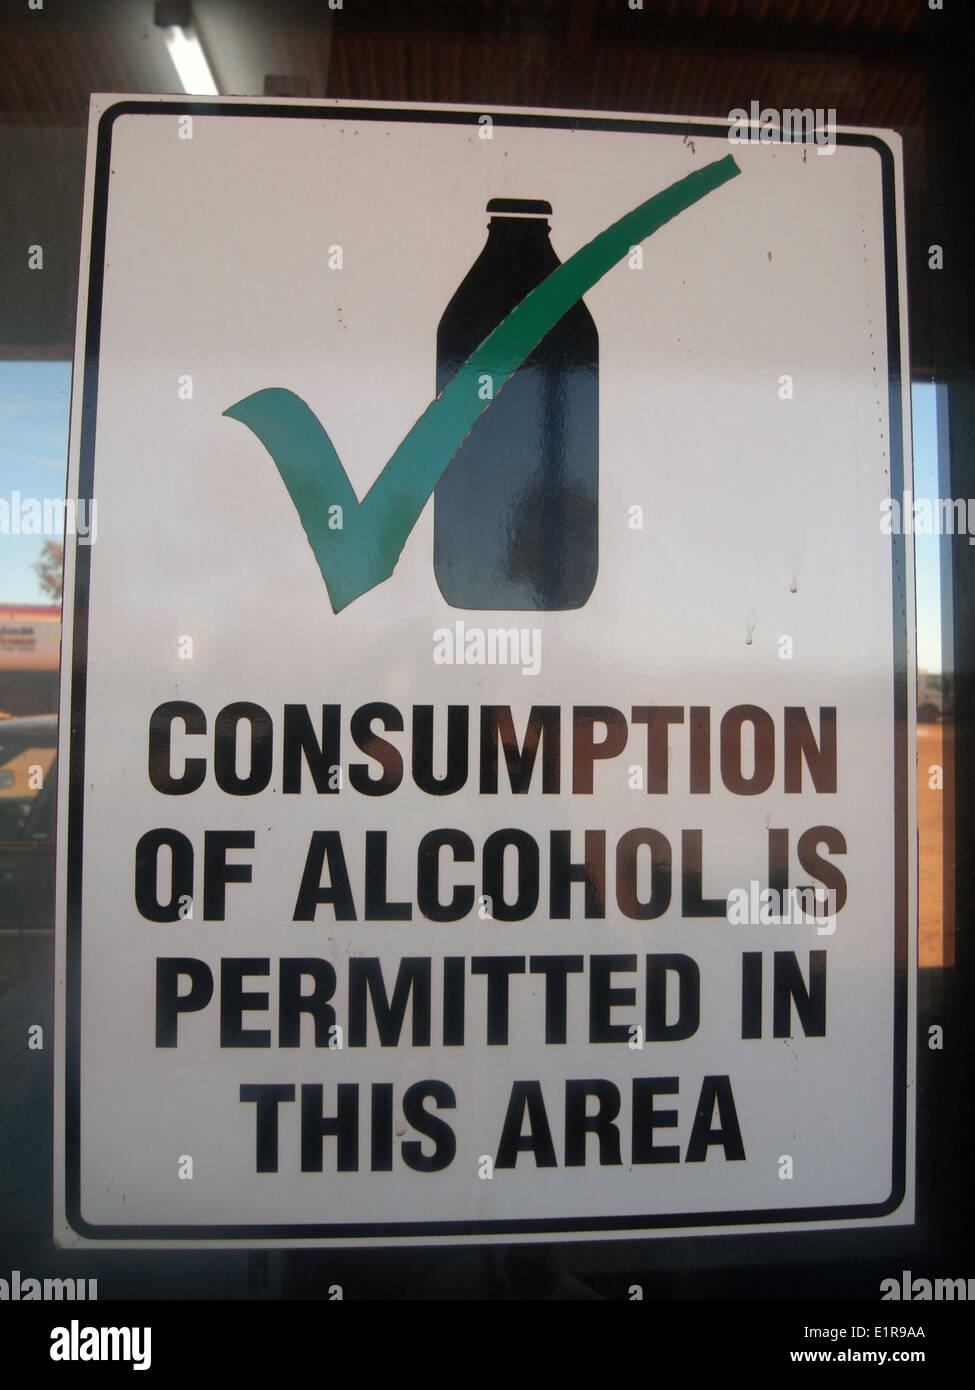 Sign permitting alcohol consumption, roadside truckstop in the Pilbara, Western Australia. No PR - Stock Image